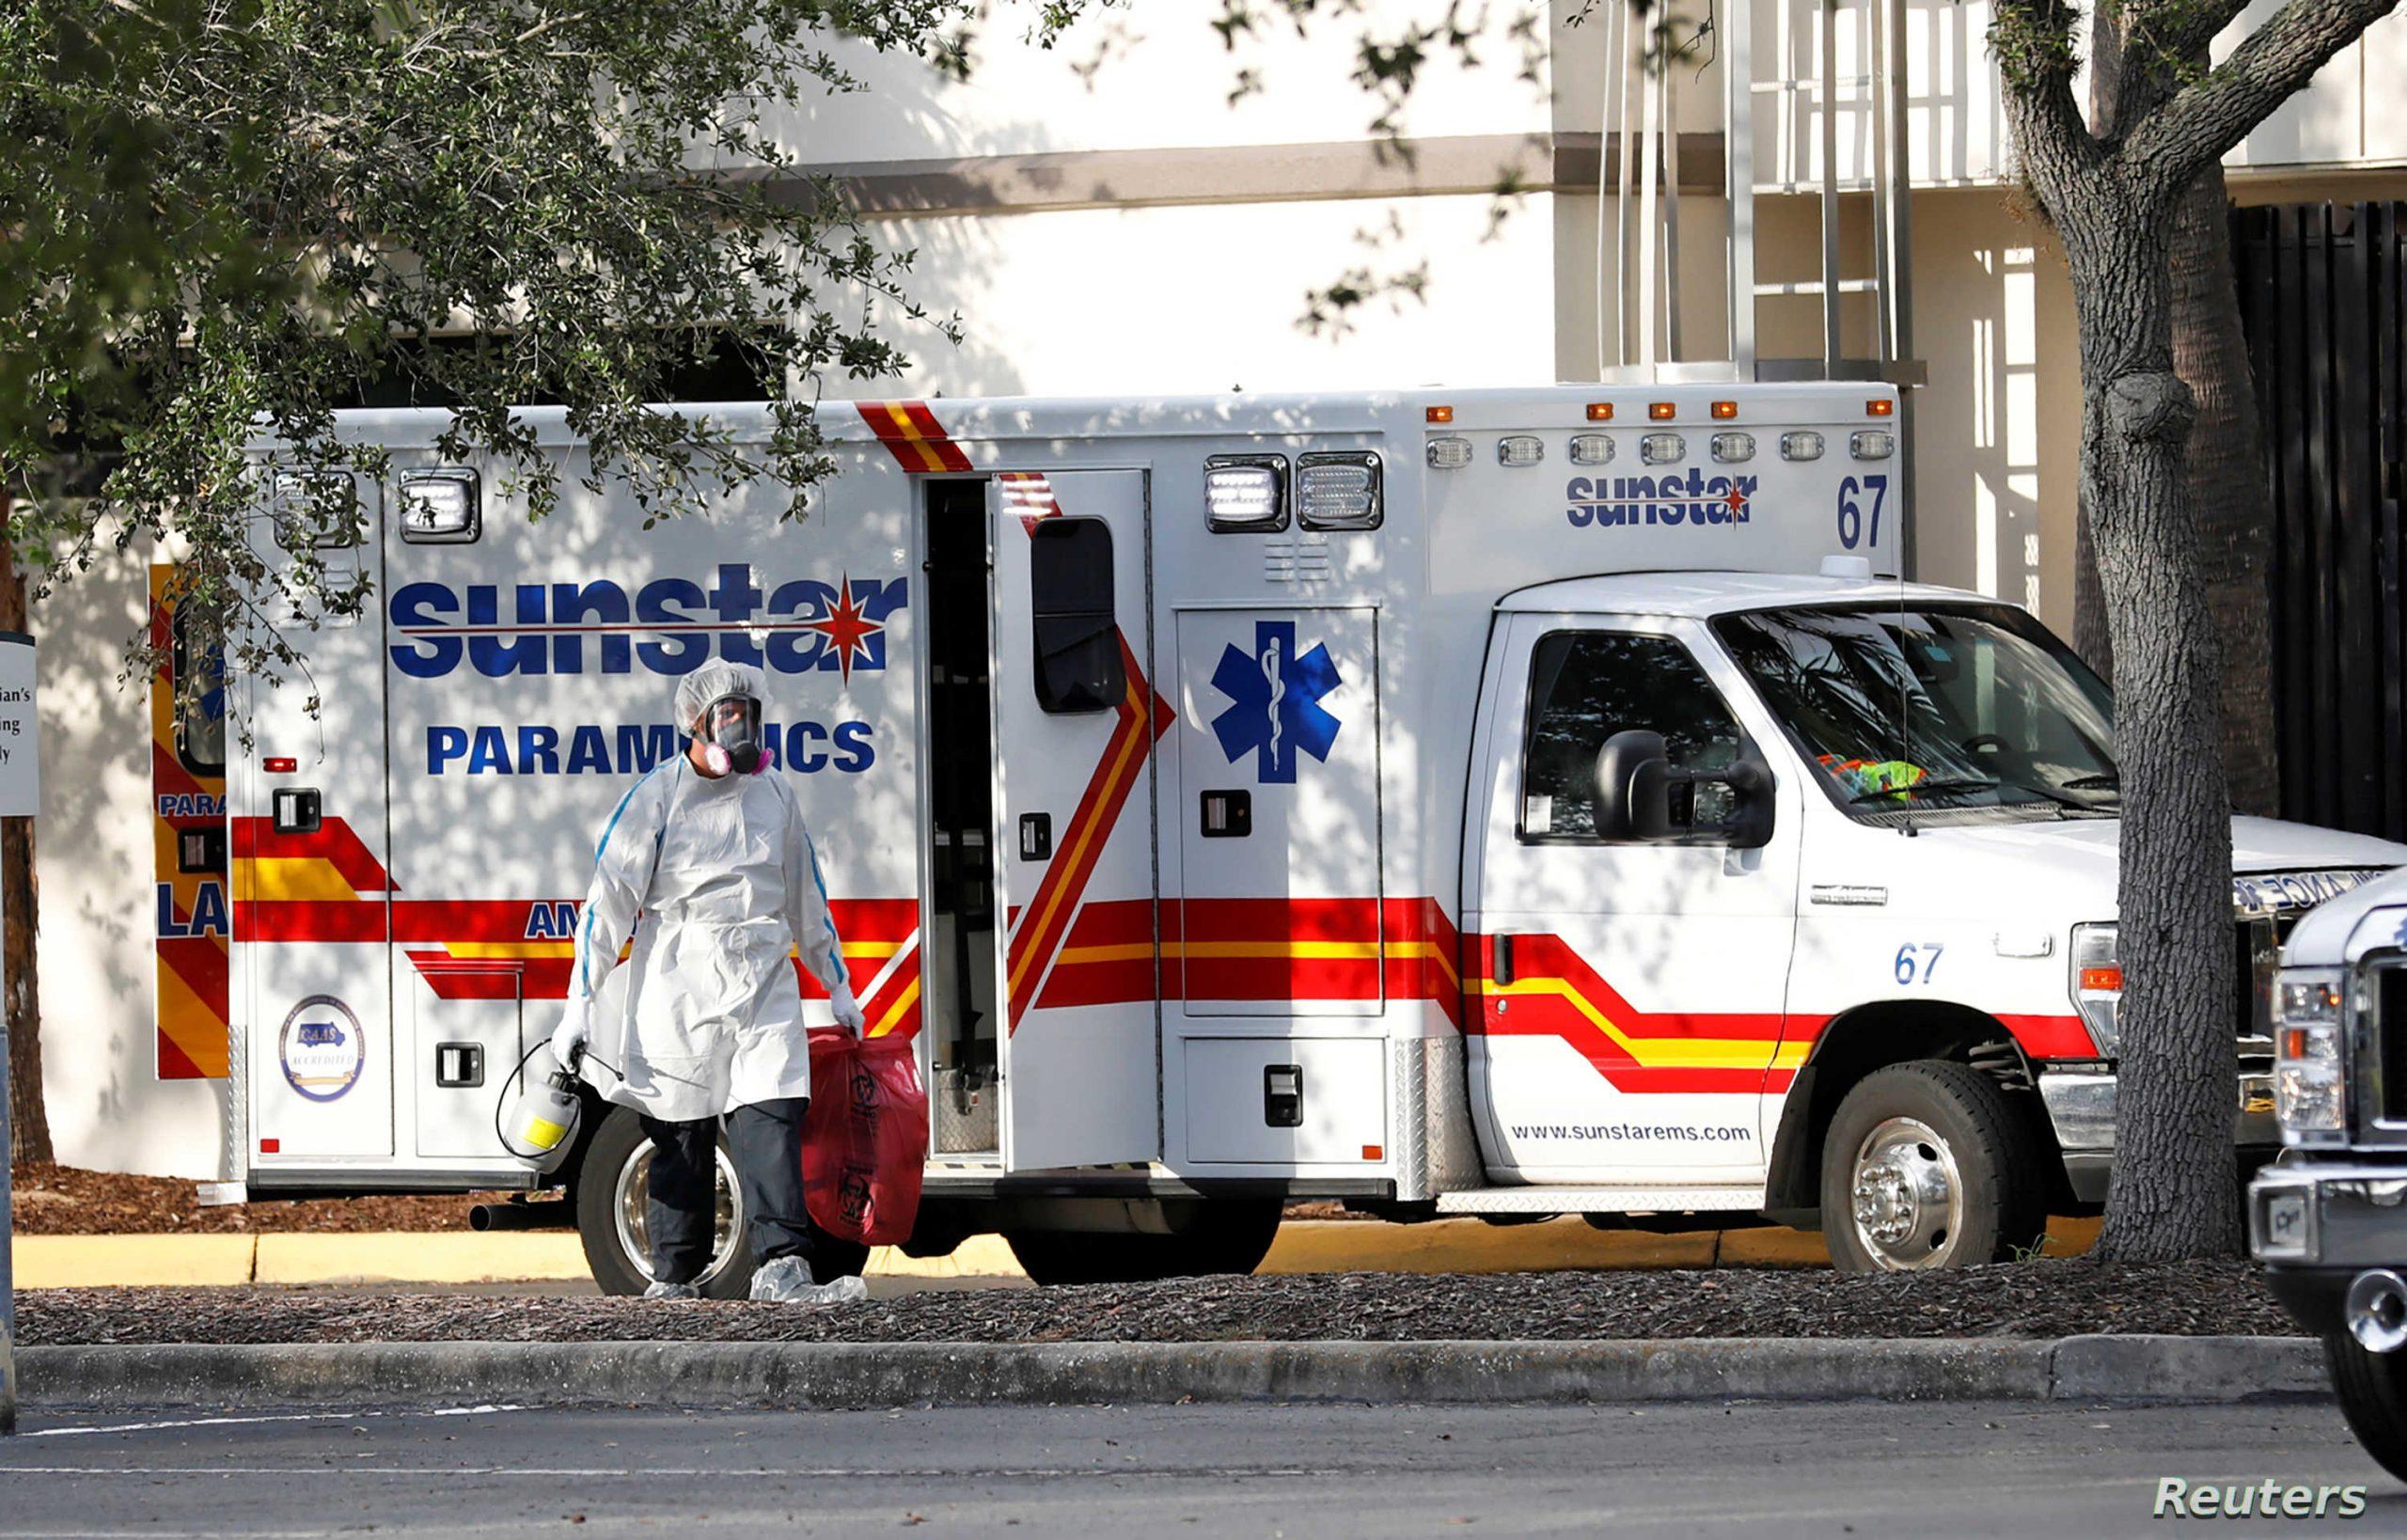 ٢٠٢١٠١٢٢ ١٨١١٠٦ scaled - #الولايات_المتحدة.. 3955 وفاة و188,952 إصابة جديدة ب #كورونا.     #العبدلي_نيوز